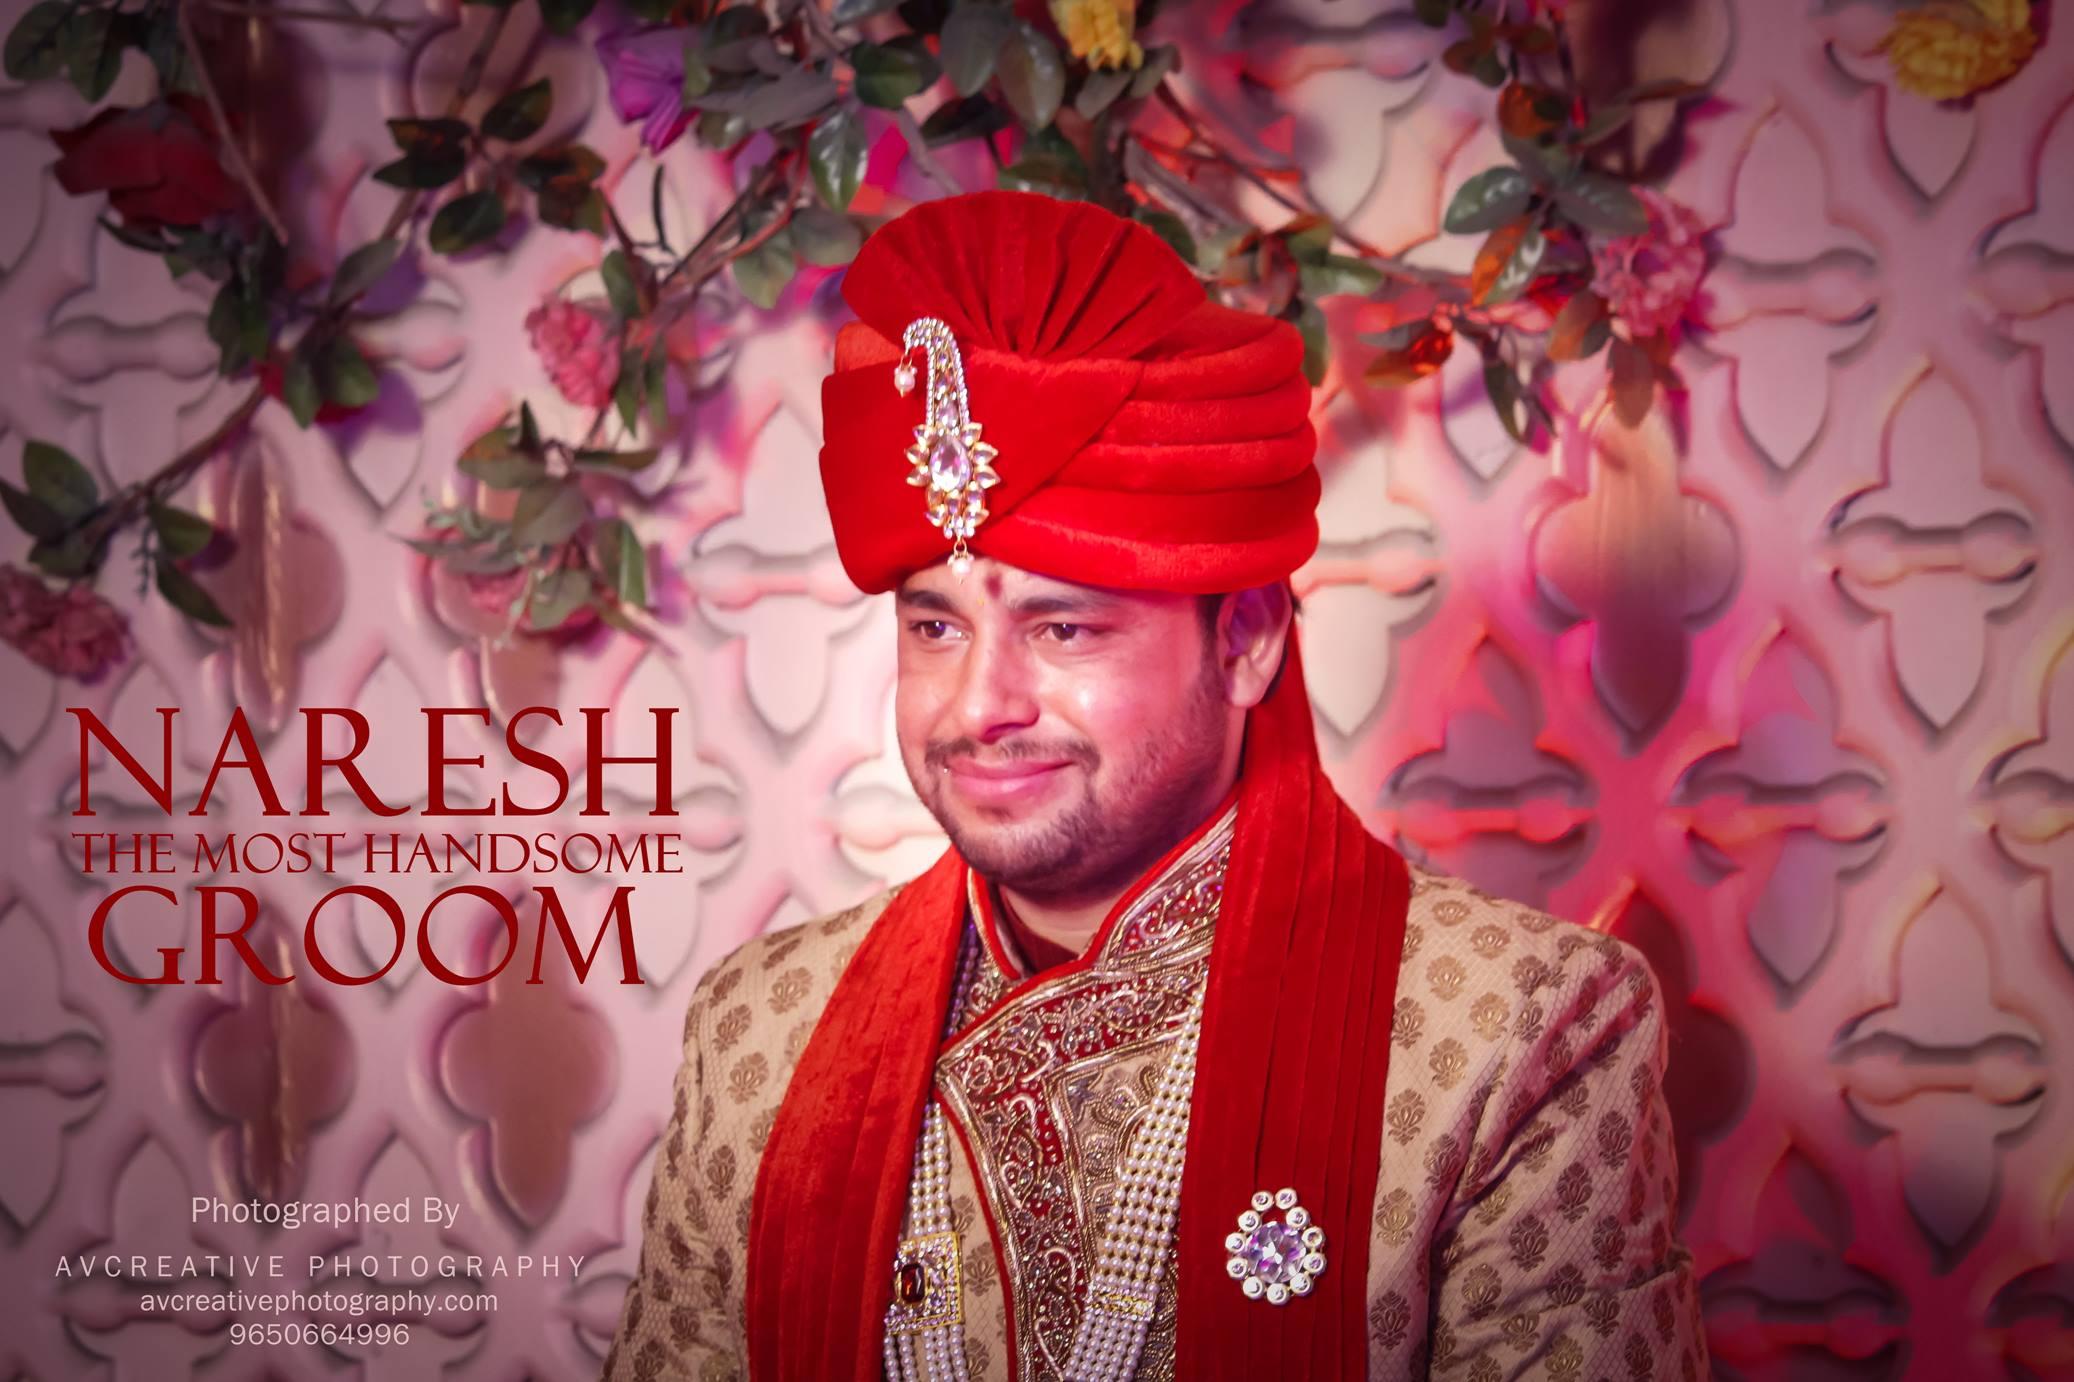 Best Wedding Photography services in Delhi NCR | 9650664996 | AV Creative Photography